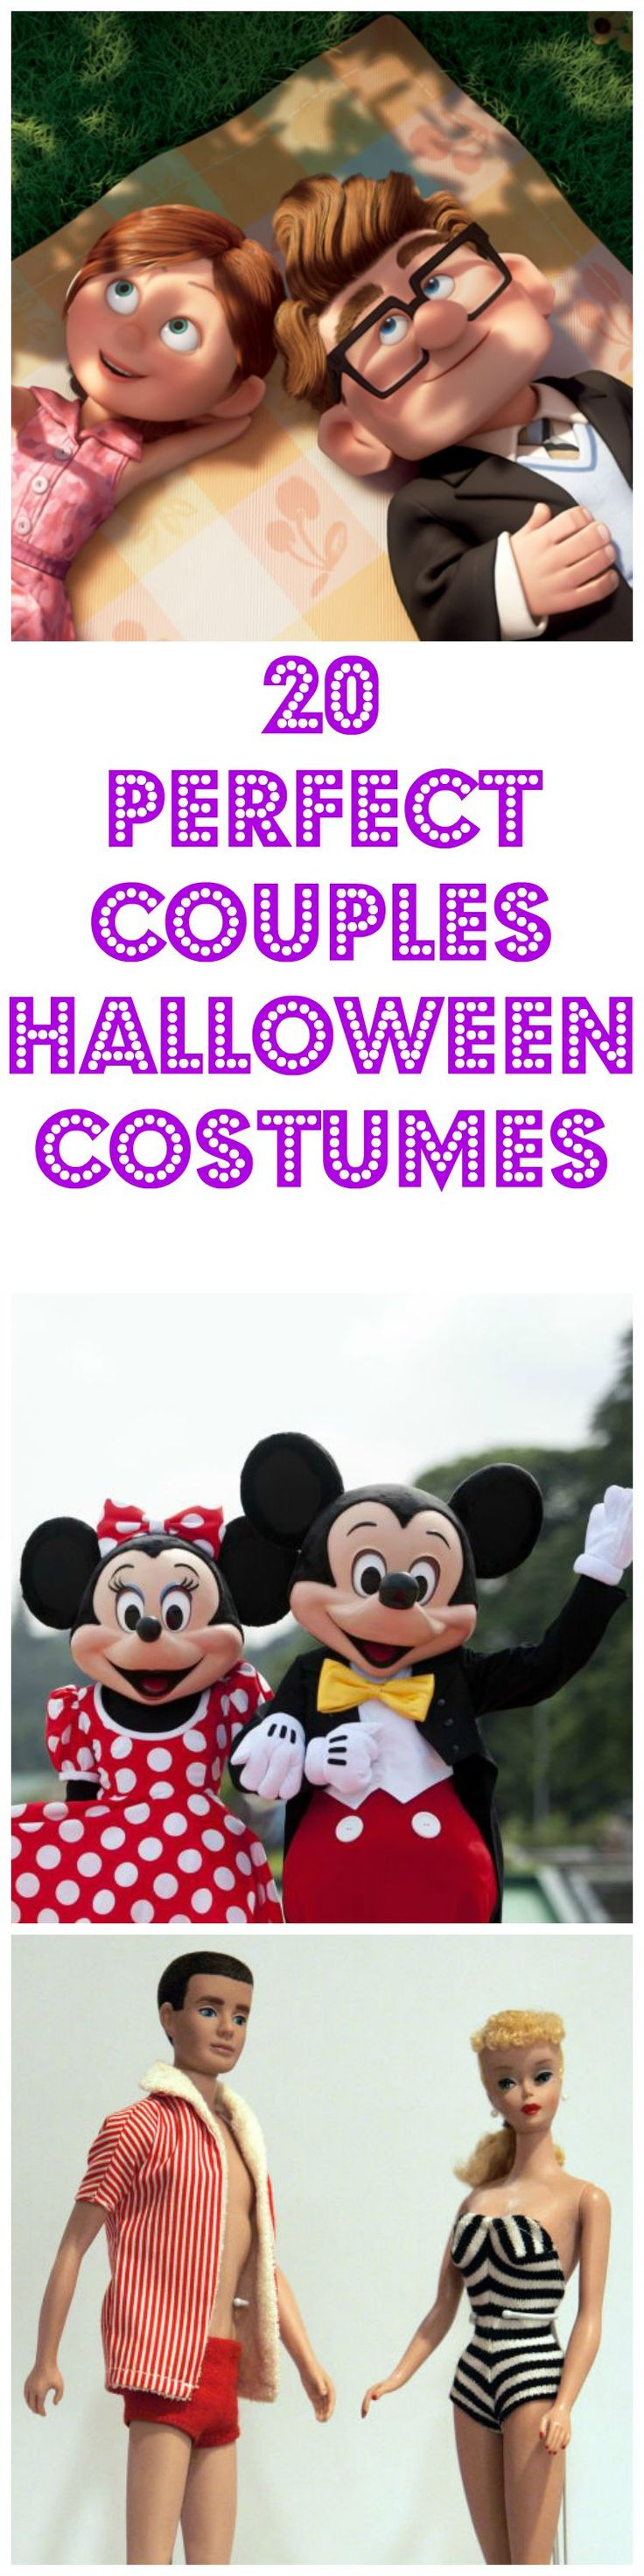 77 best fancy dress images on Pinterest | Halloween couples ...